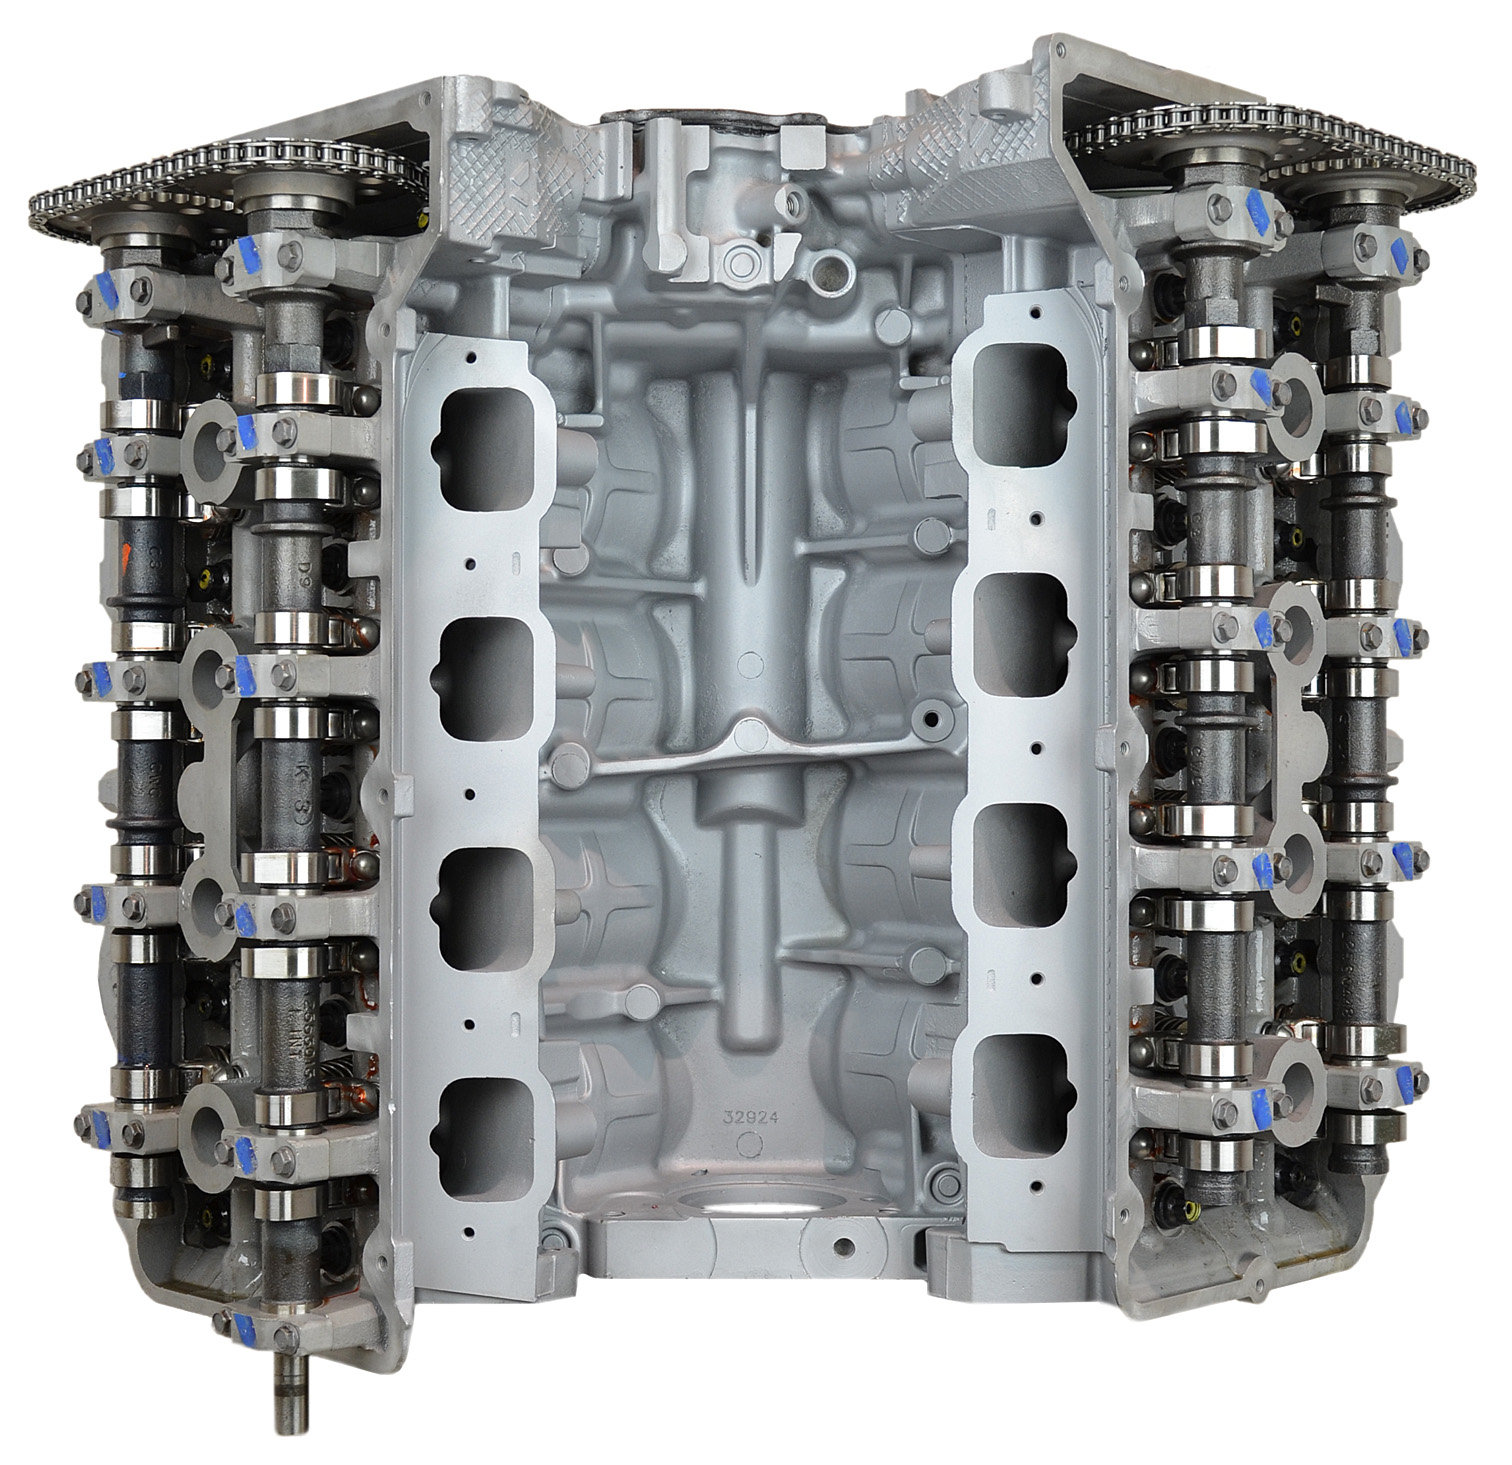 00-02 Cadillac Deville 4.6 NorthStar Engine VIN 9